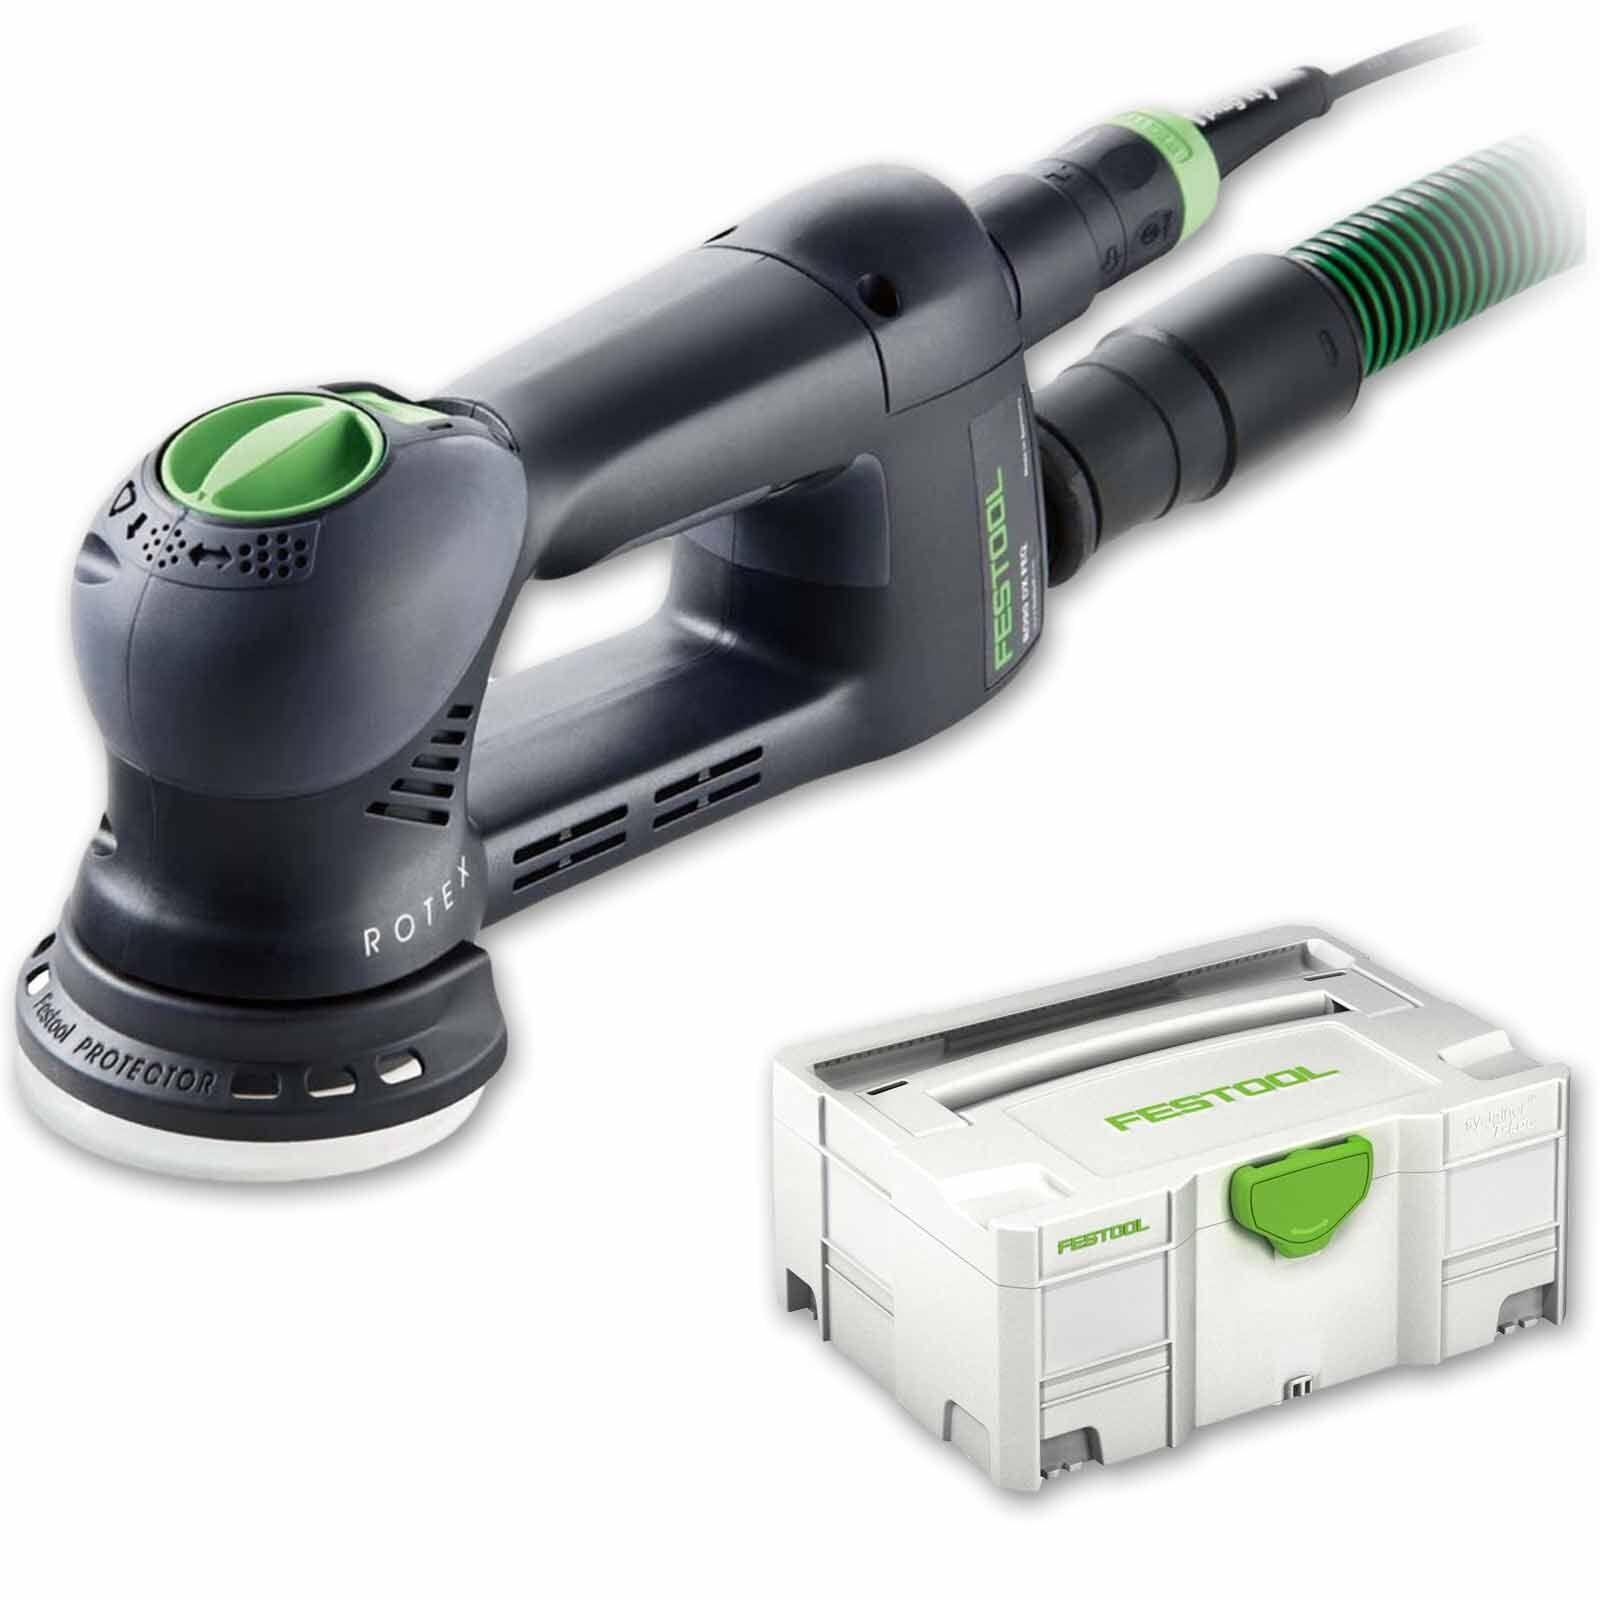 Festool Festool Festool ROTEX RO 90 DX FEQ-Plus getriebe-exzenter Delta Meuleuse 571819 150680 85f7aa